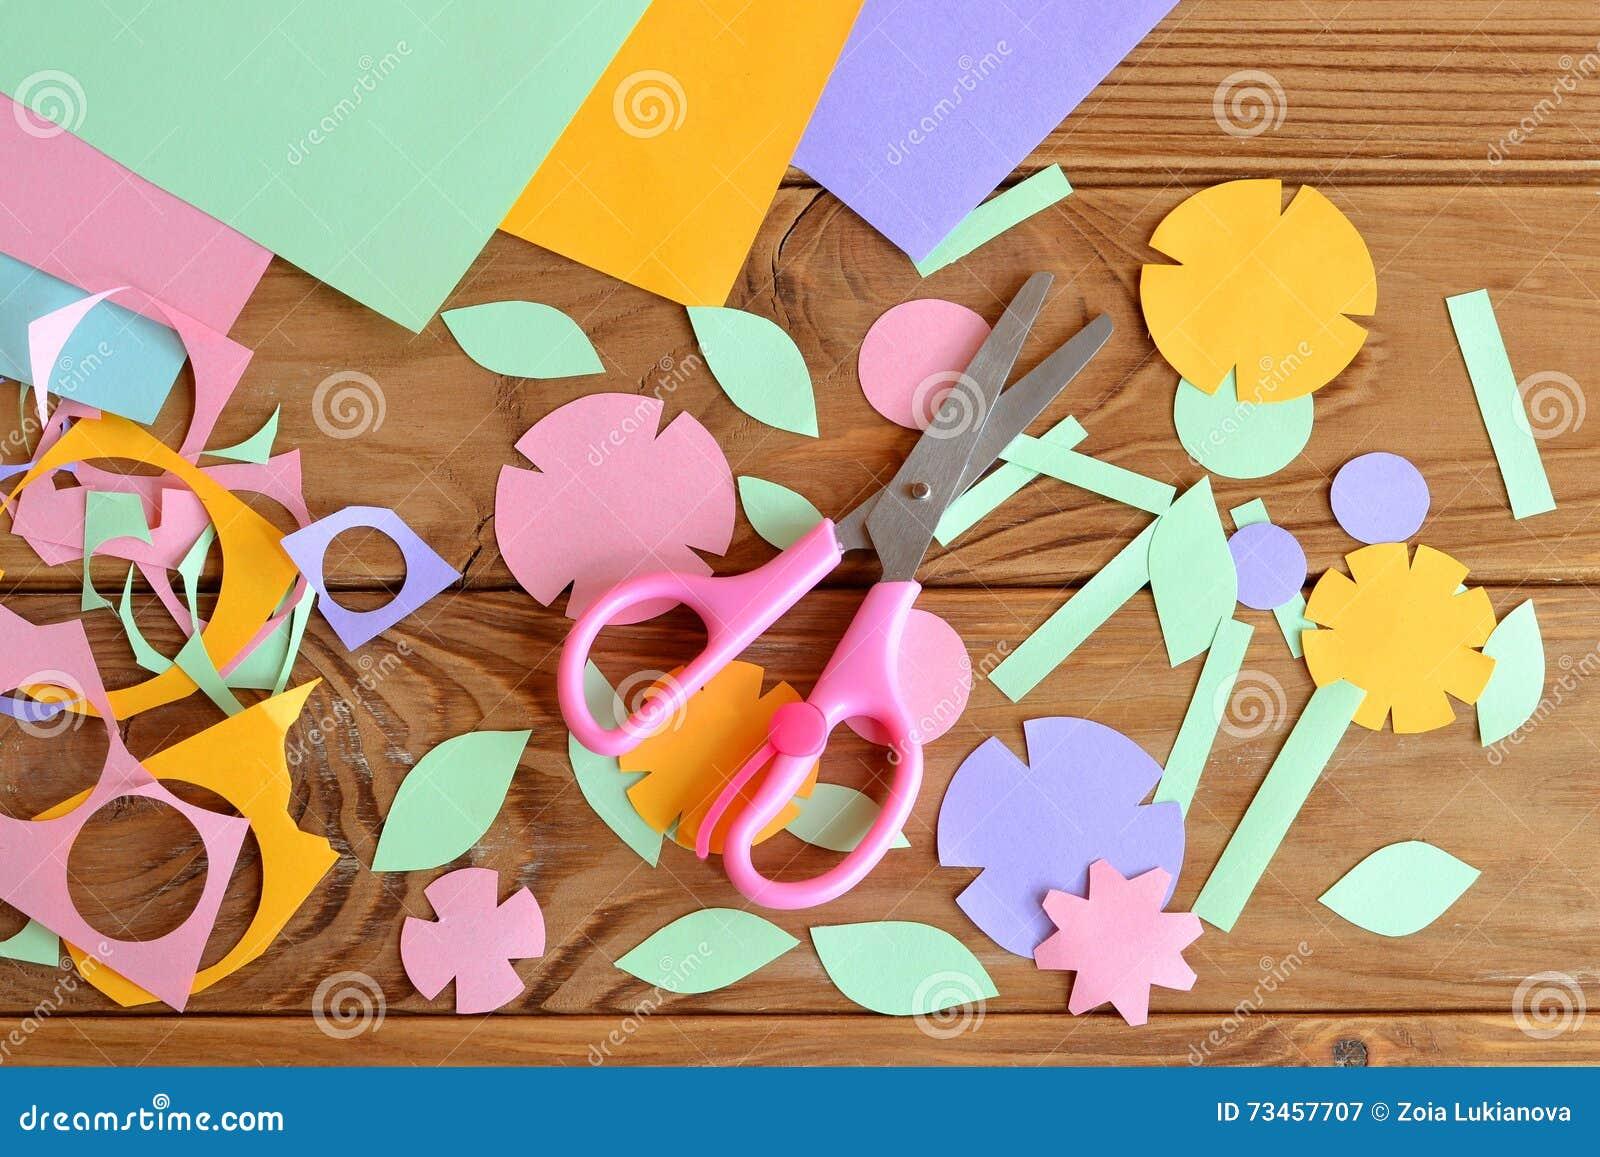 Paper flowers paper sheets scissors paper scrap on a wooden table paper flowers paper sheets scissors paper scrap on a wooden table mightylinksfo